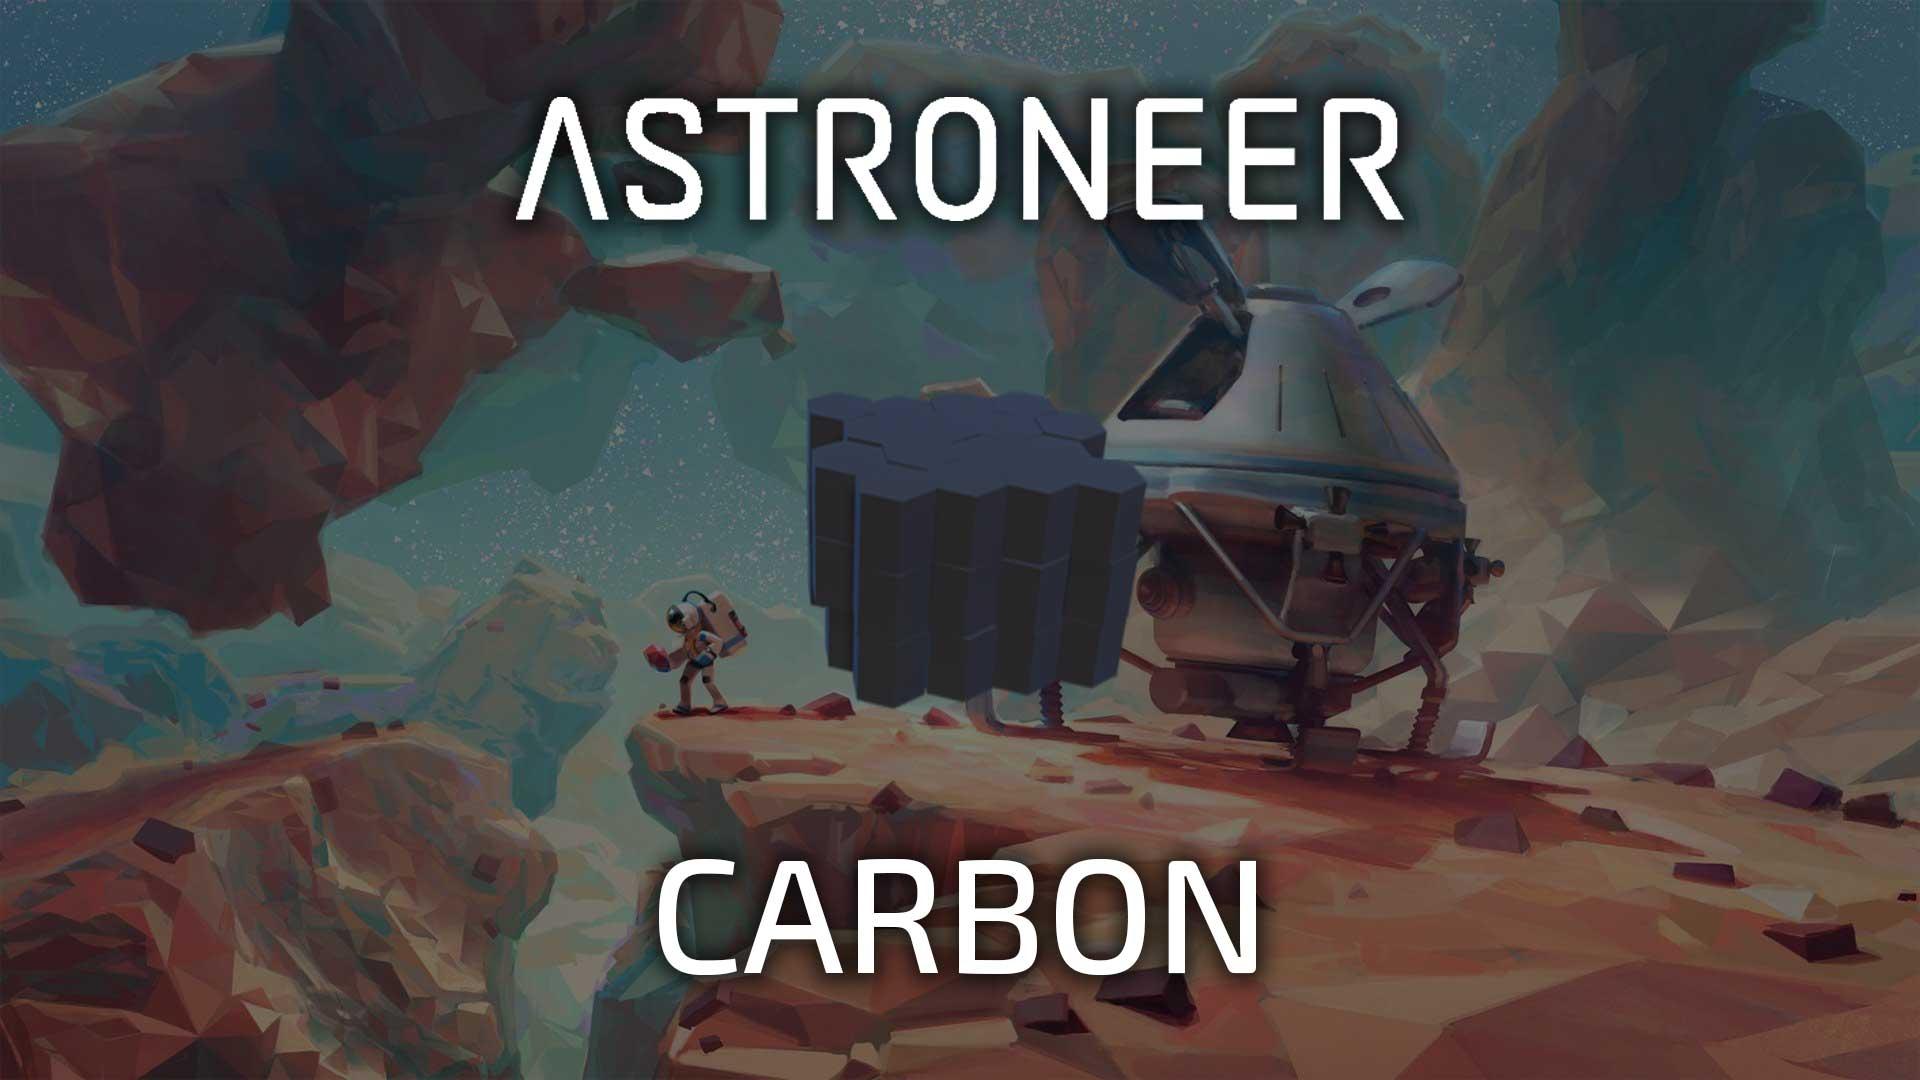 astroneer carbon